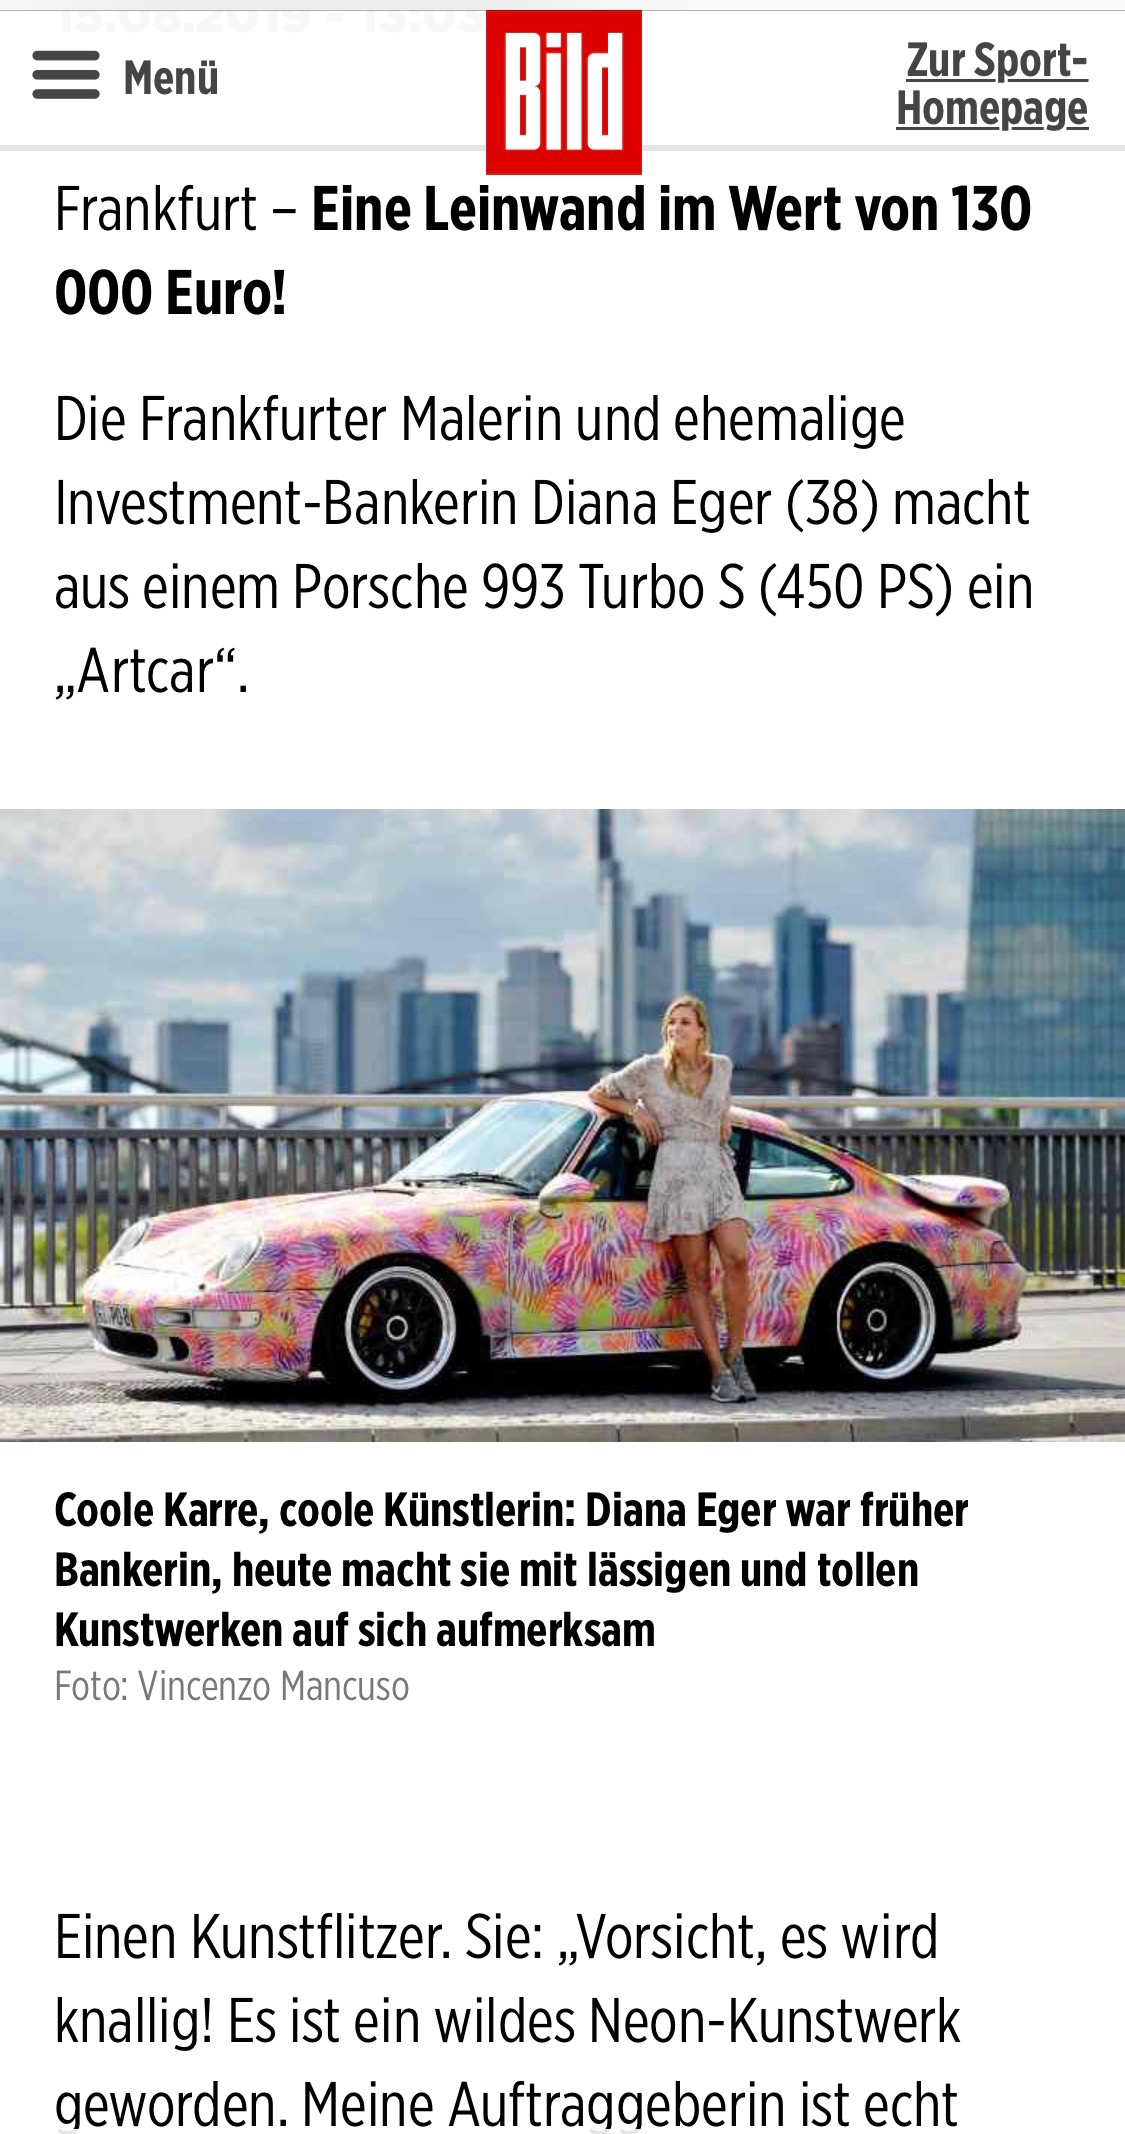 Diana Eger, dianaeger, Artcar, art, Frankfurt, Porsche, 993, Popart, kunst, PorscheTurbo, Bildzeitung, bild